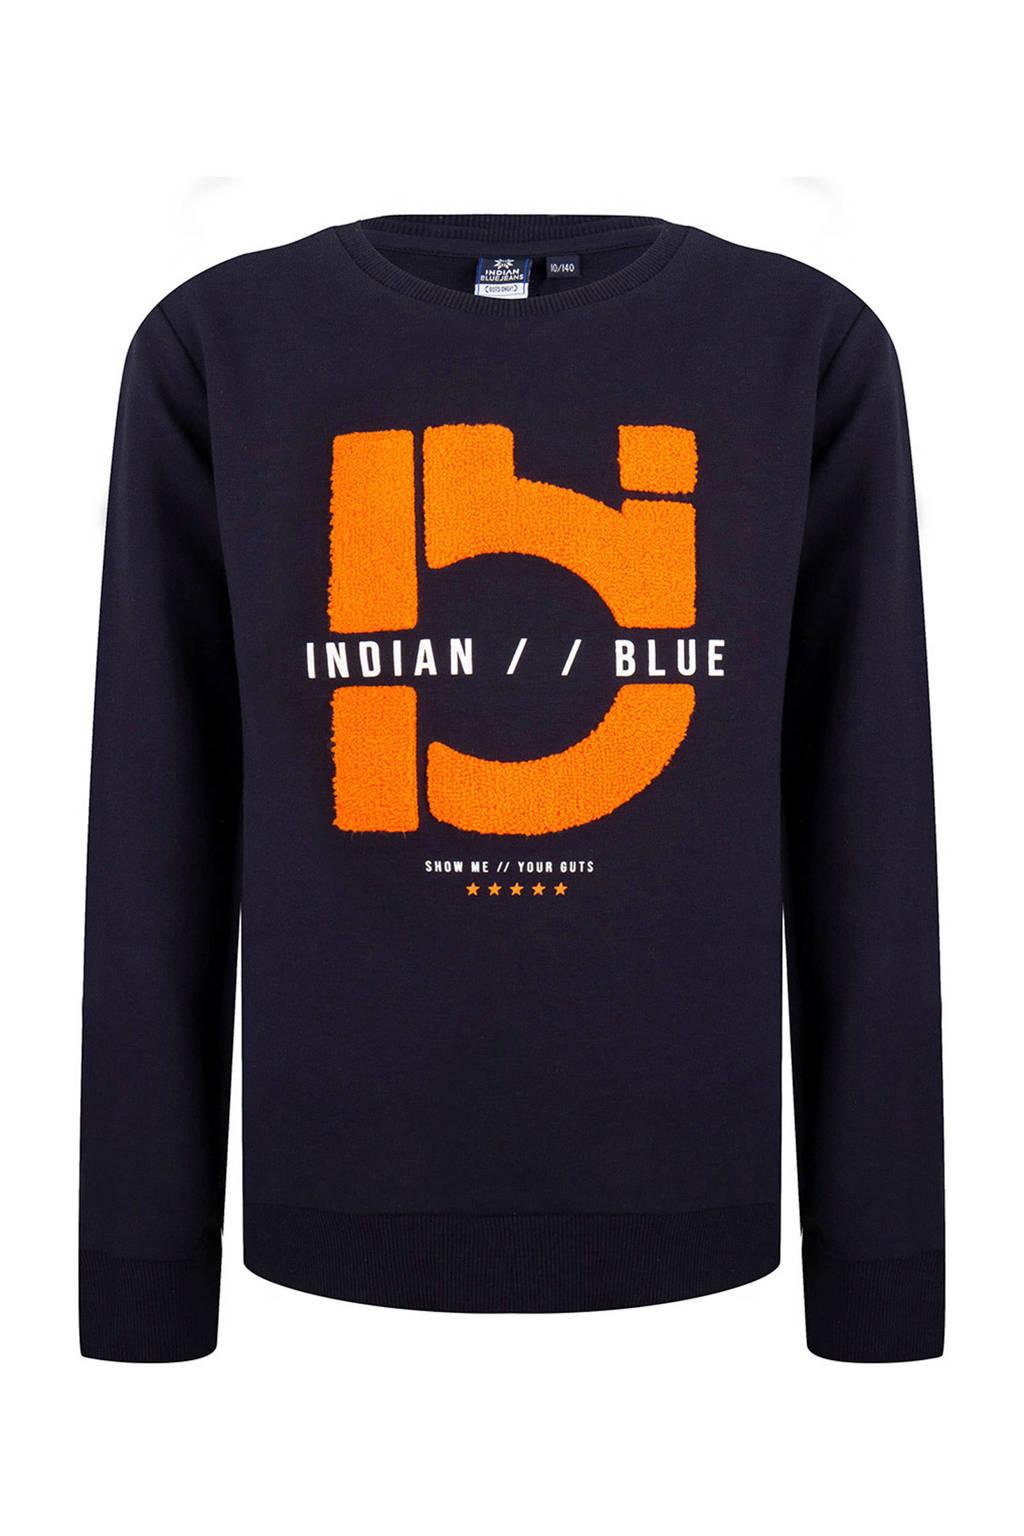 Indian Blue Jeans sweater met logo donkerblauw, Donkerblauw